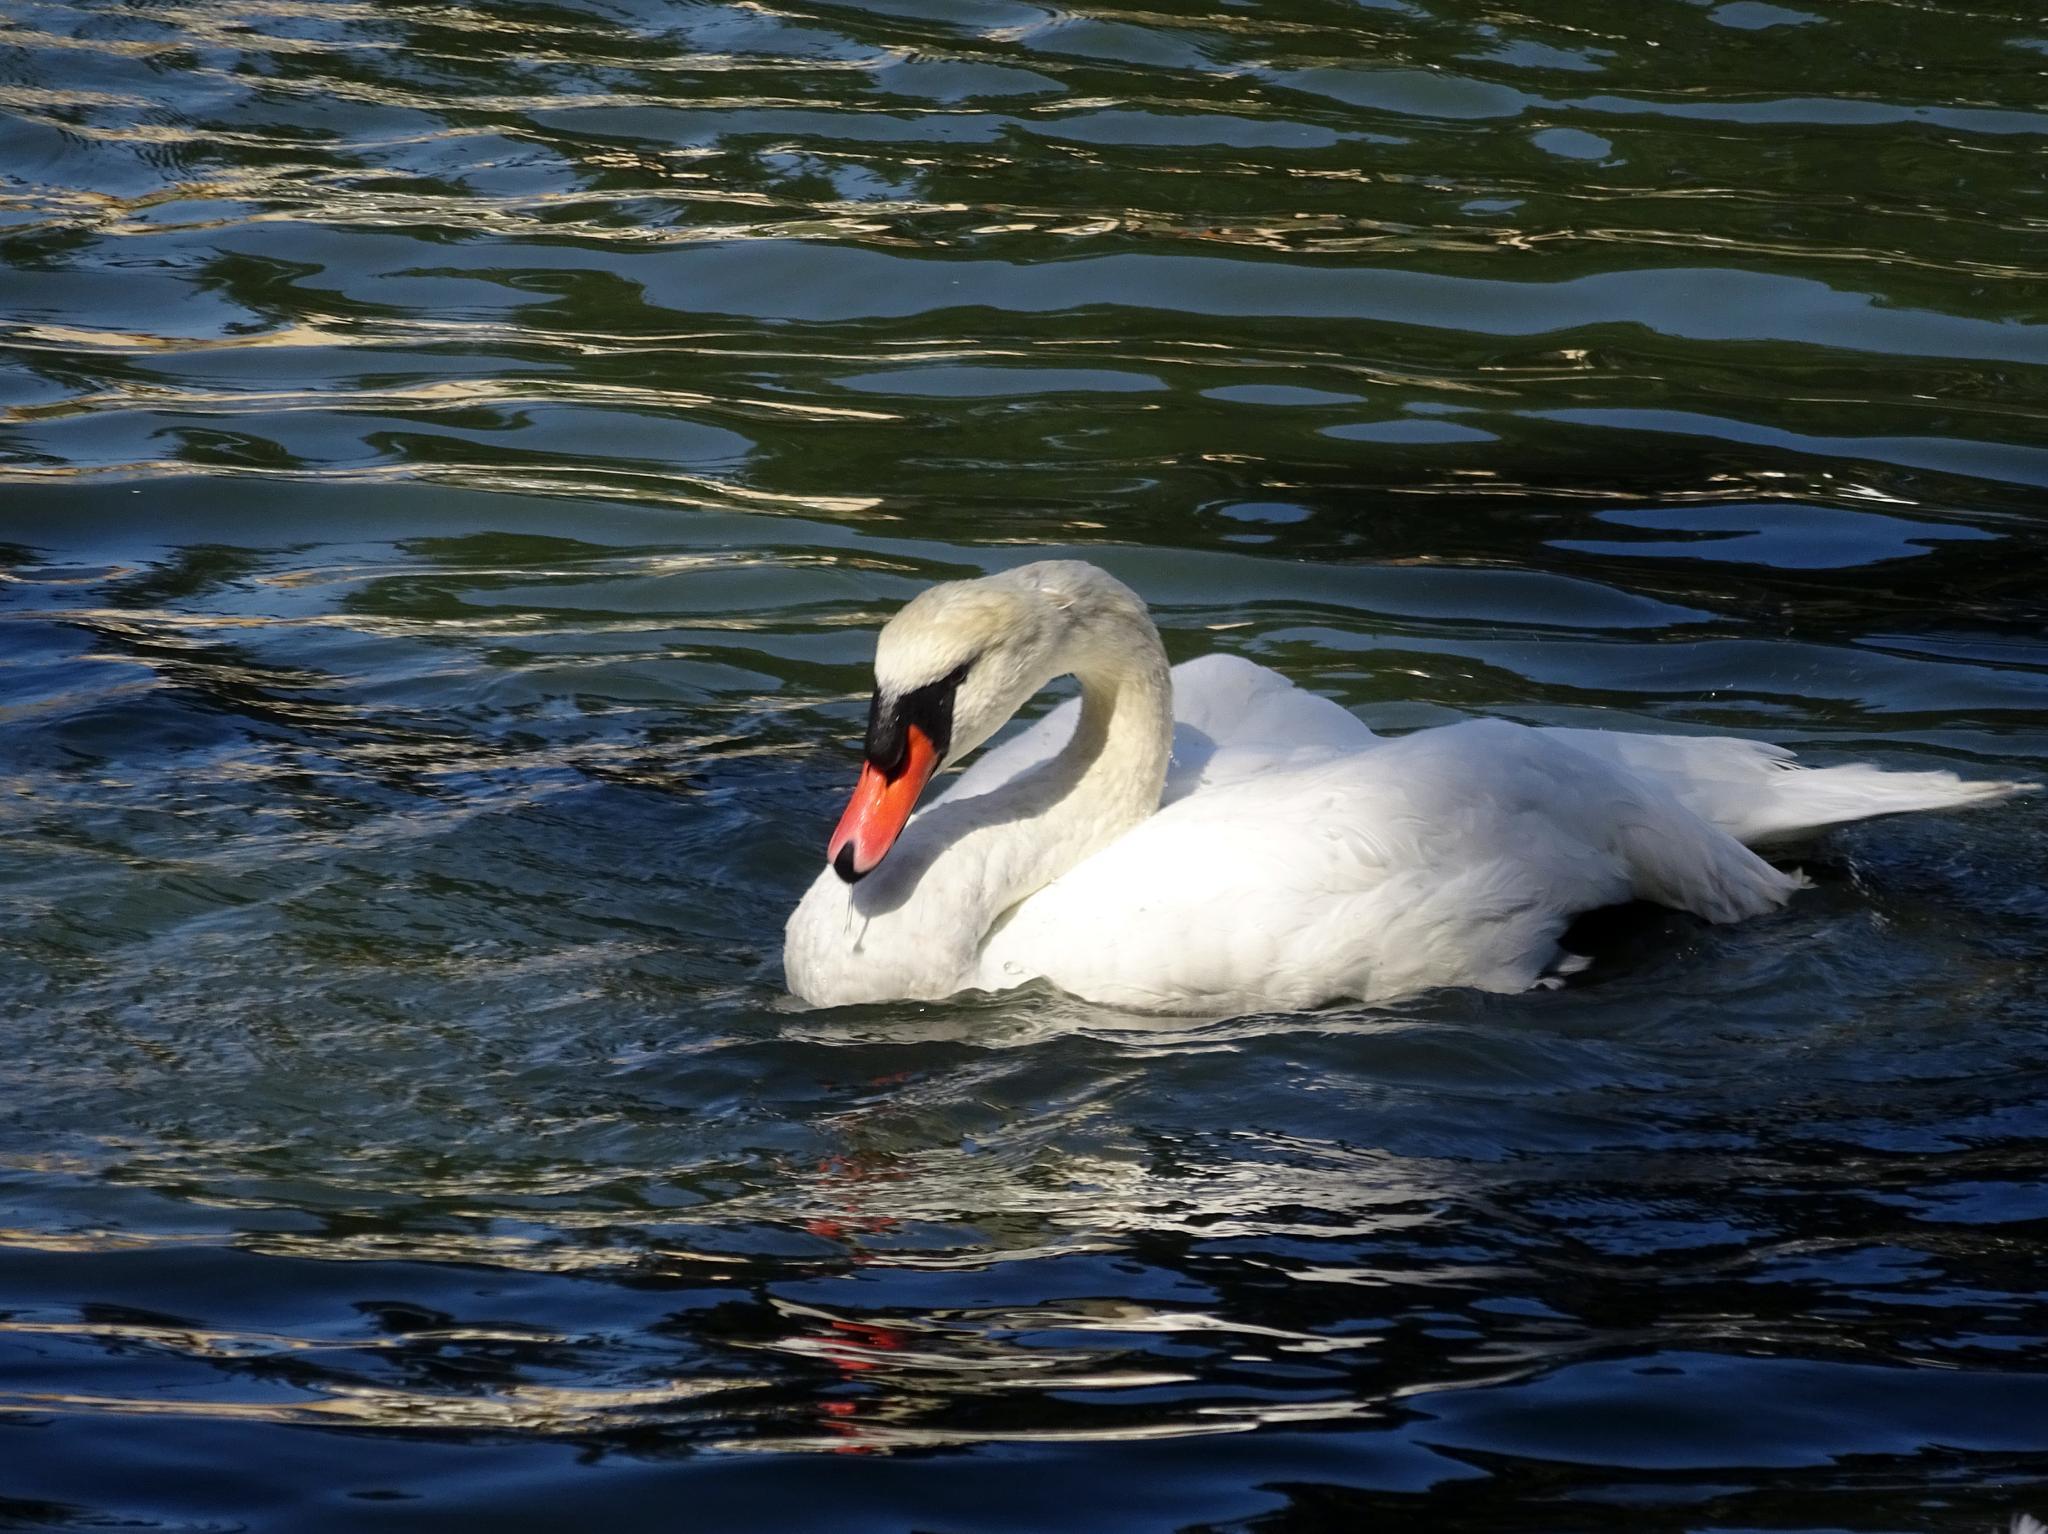 Playful swan by gudrun.jones